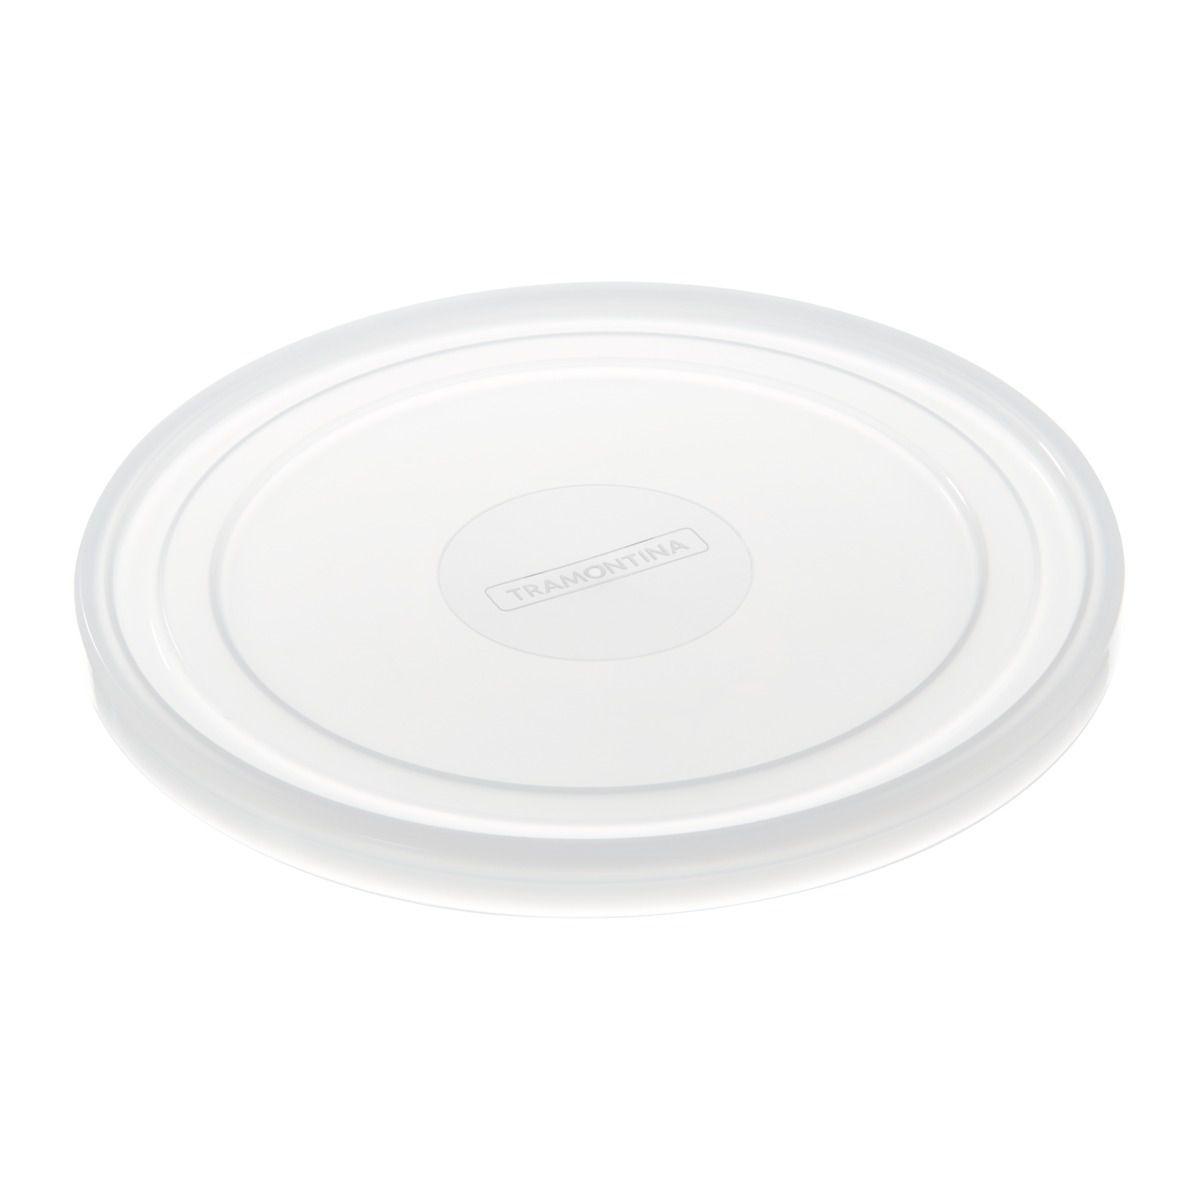 Tampa de Plástico Tramontina Freezinox Redonda 28 cm 61992/280   Lojas Estrela